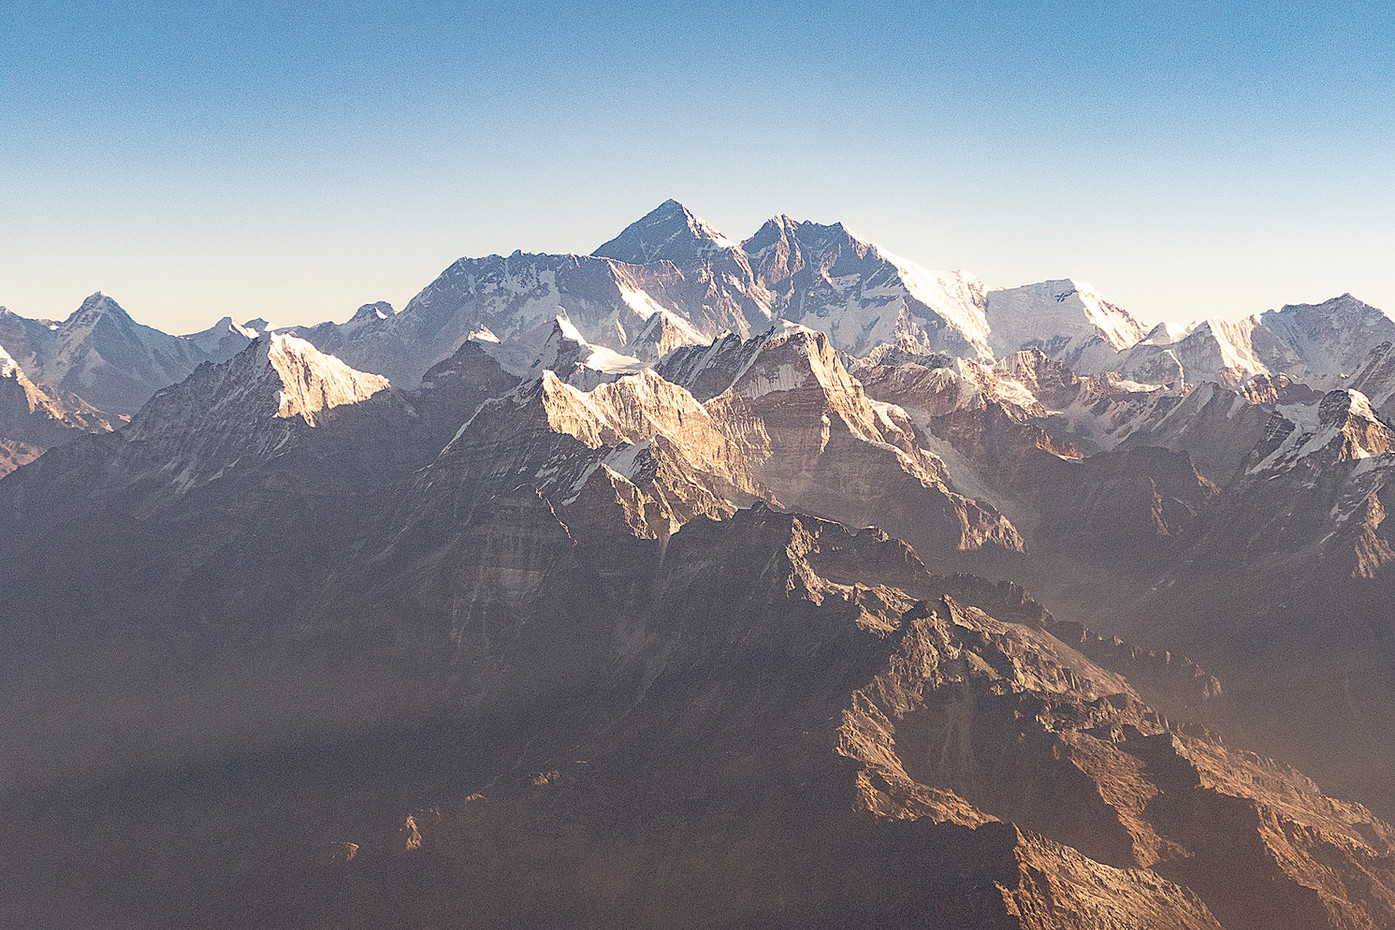 Mount Everest & Himalayas mountain range, Nepal